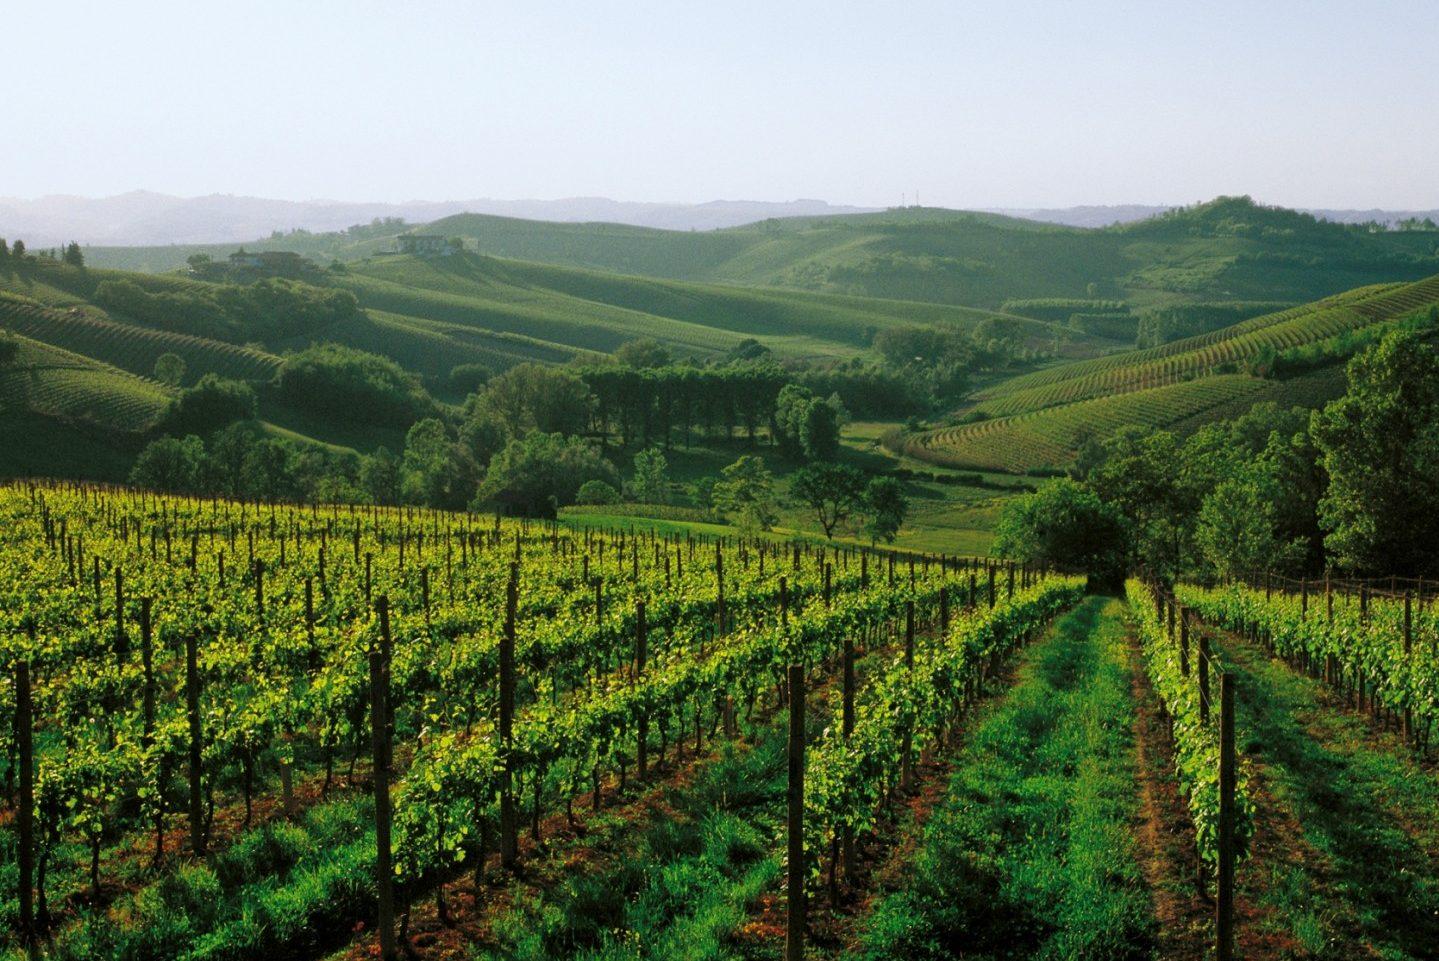 Italy, Piedmont, piemonte, Asti, (Turin) Vineyards, Wine © From the Cartoline dellAstigiano photo contest